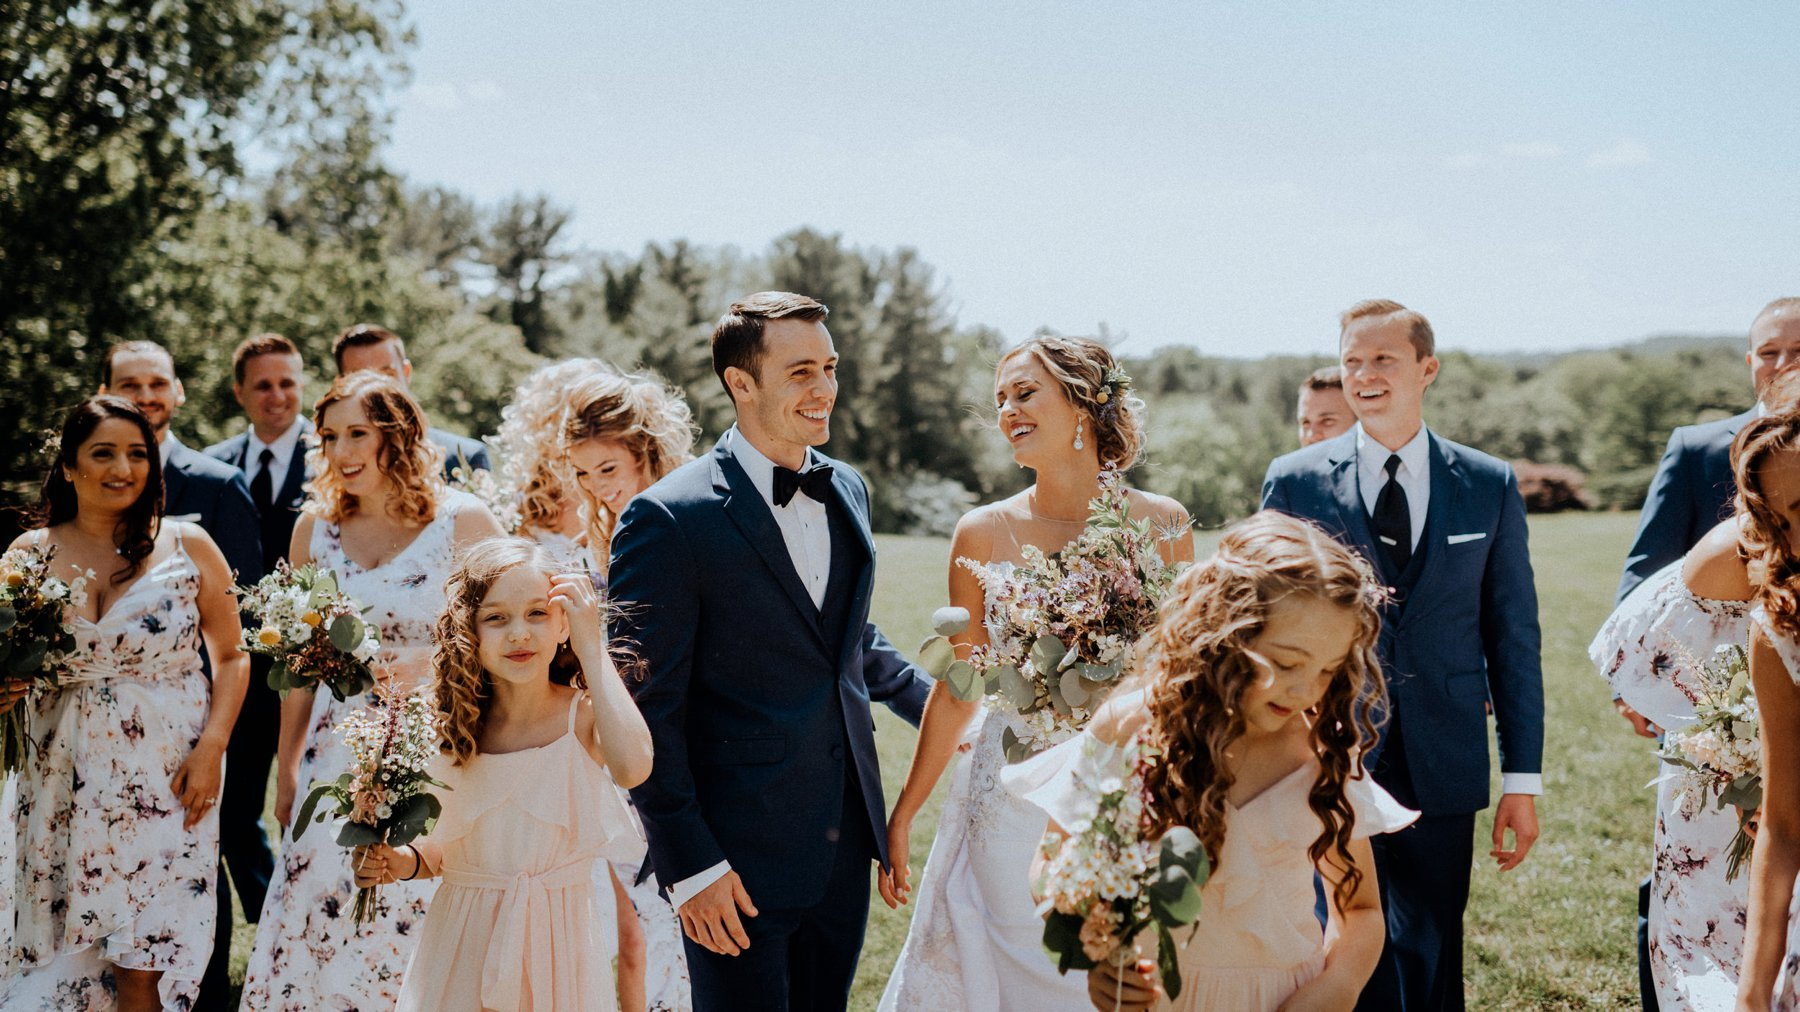 123-110-greenville-country-club-wedding-6.jpg